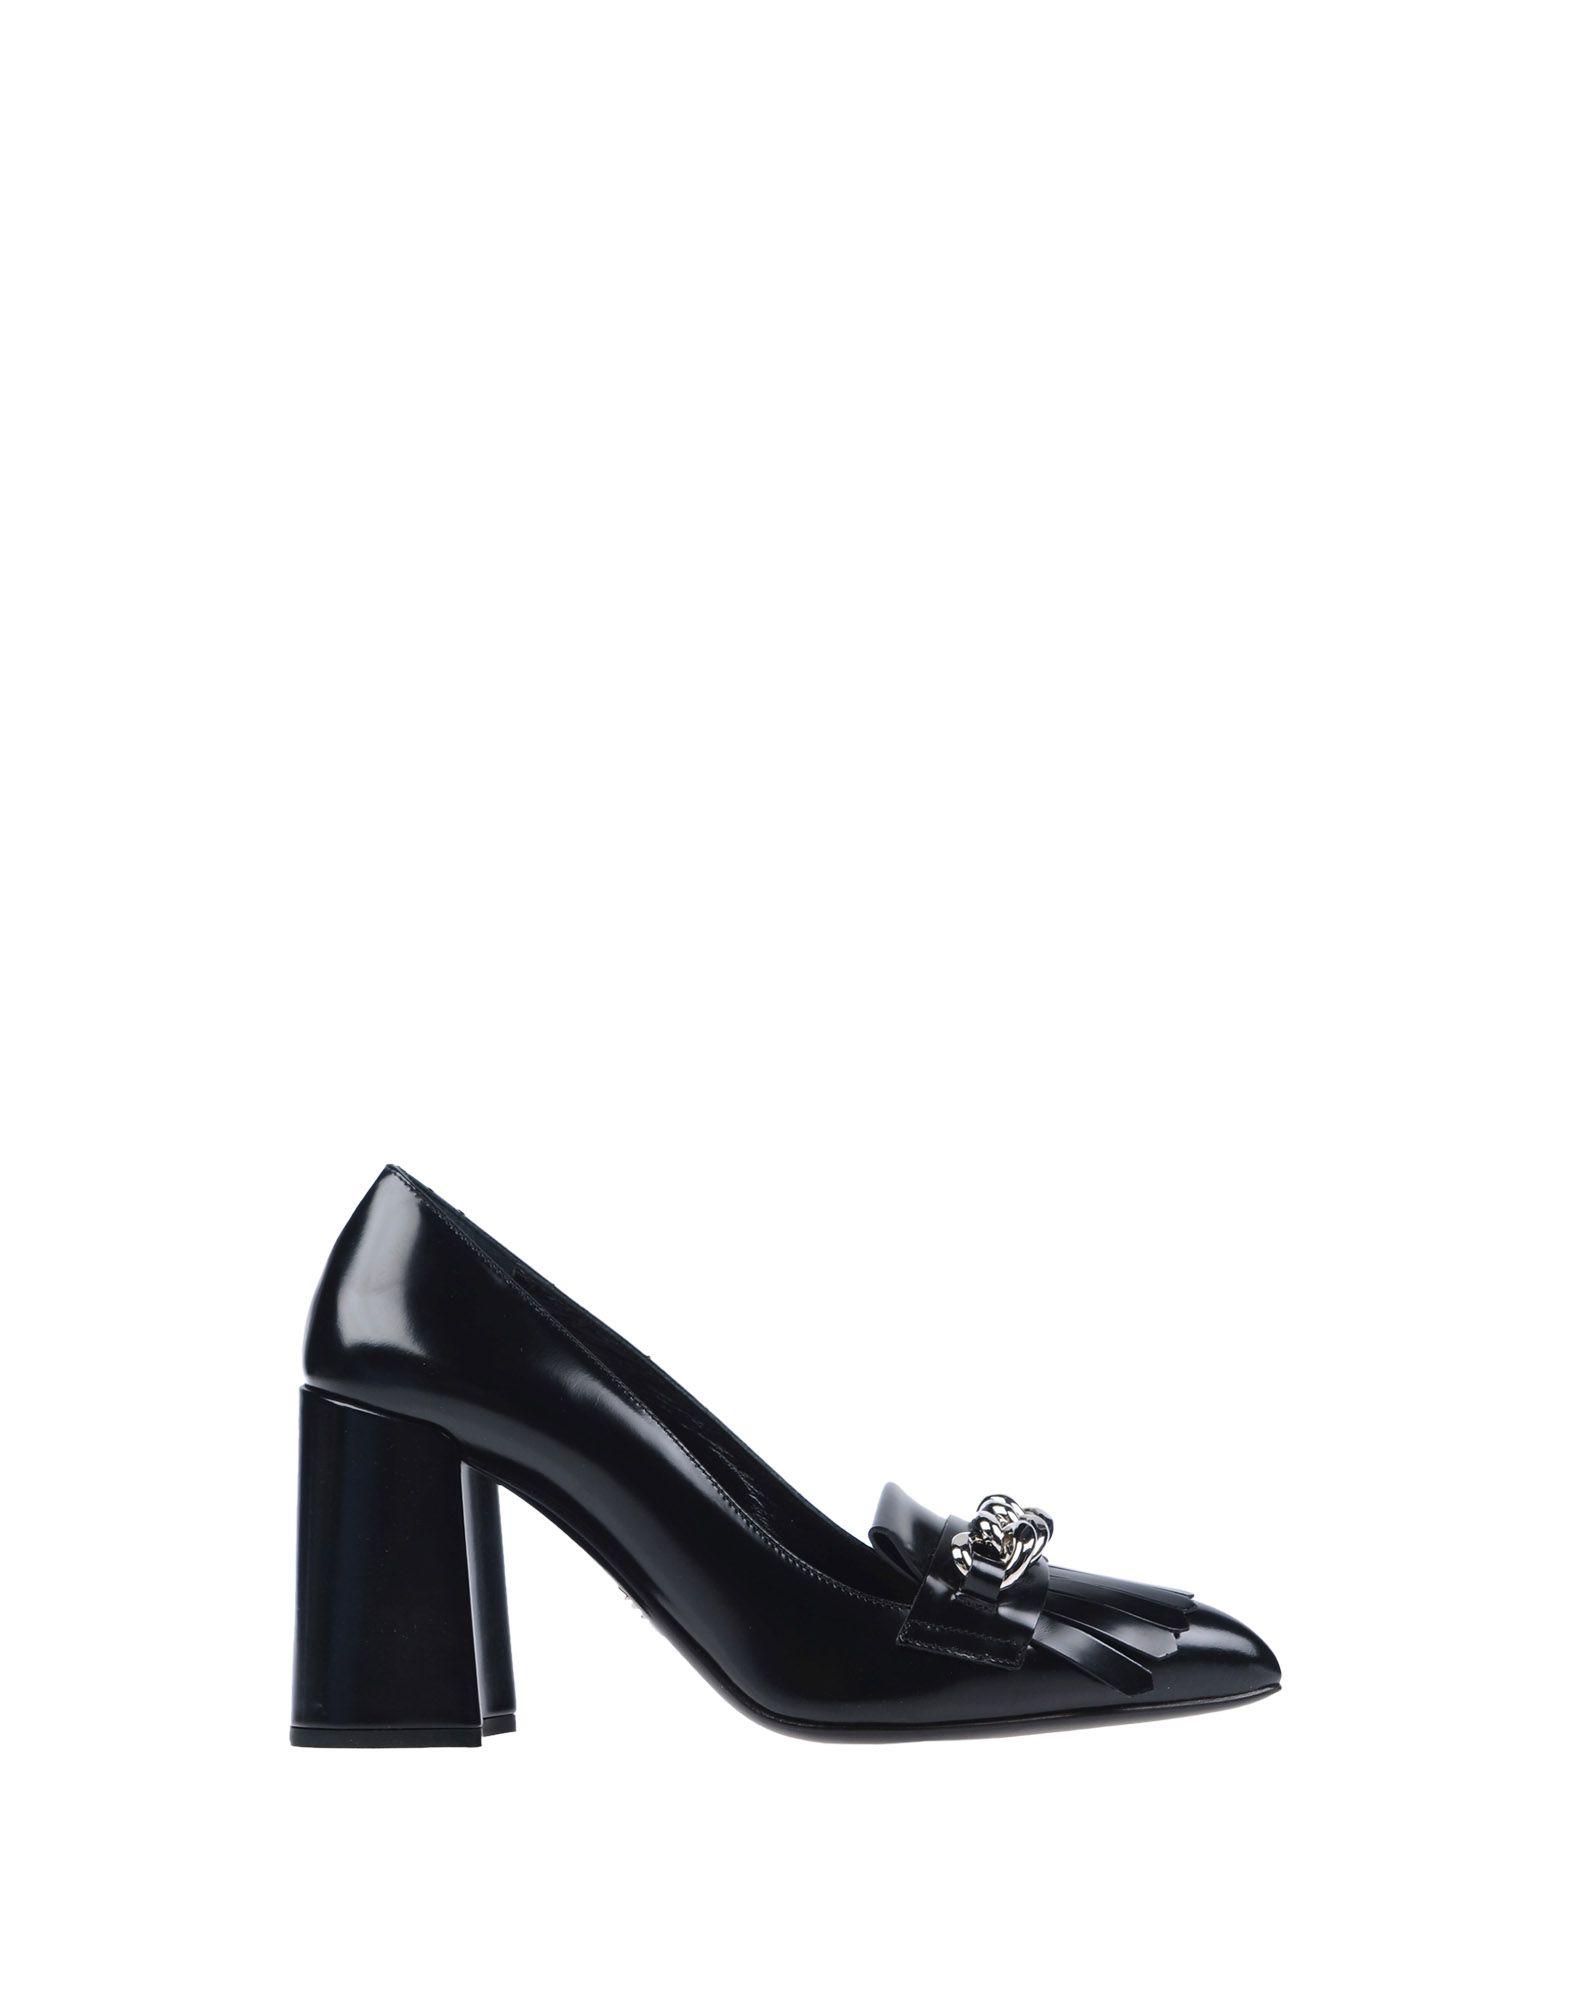 Prada Mokassins Damen  11234208TLGünstige Schuhe gut aussehende Schuhe 11234208TLGünstige 091c43